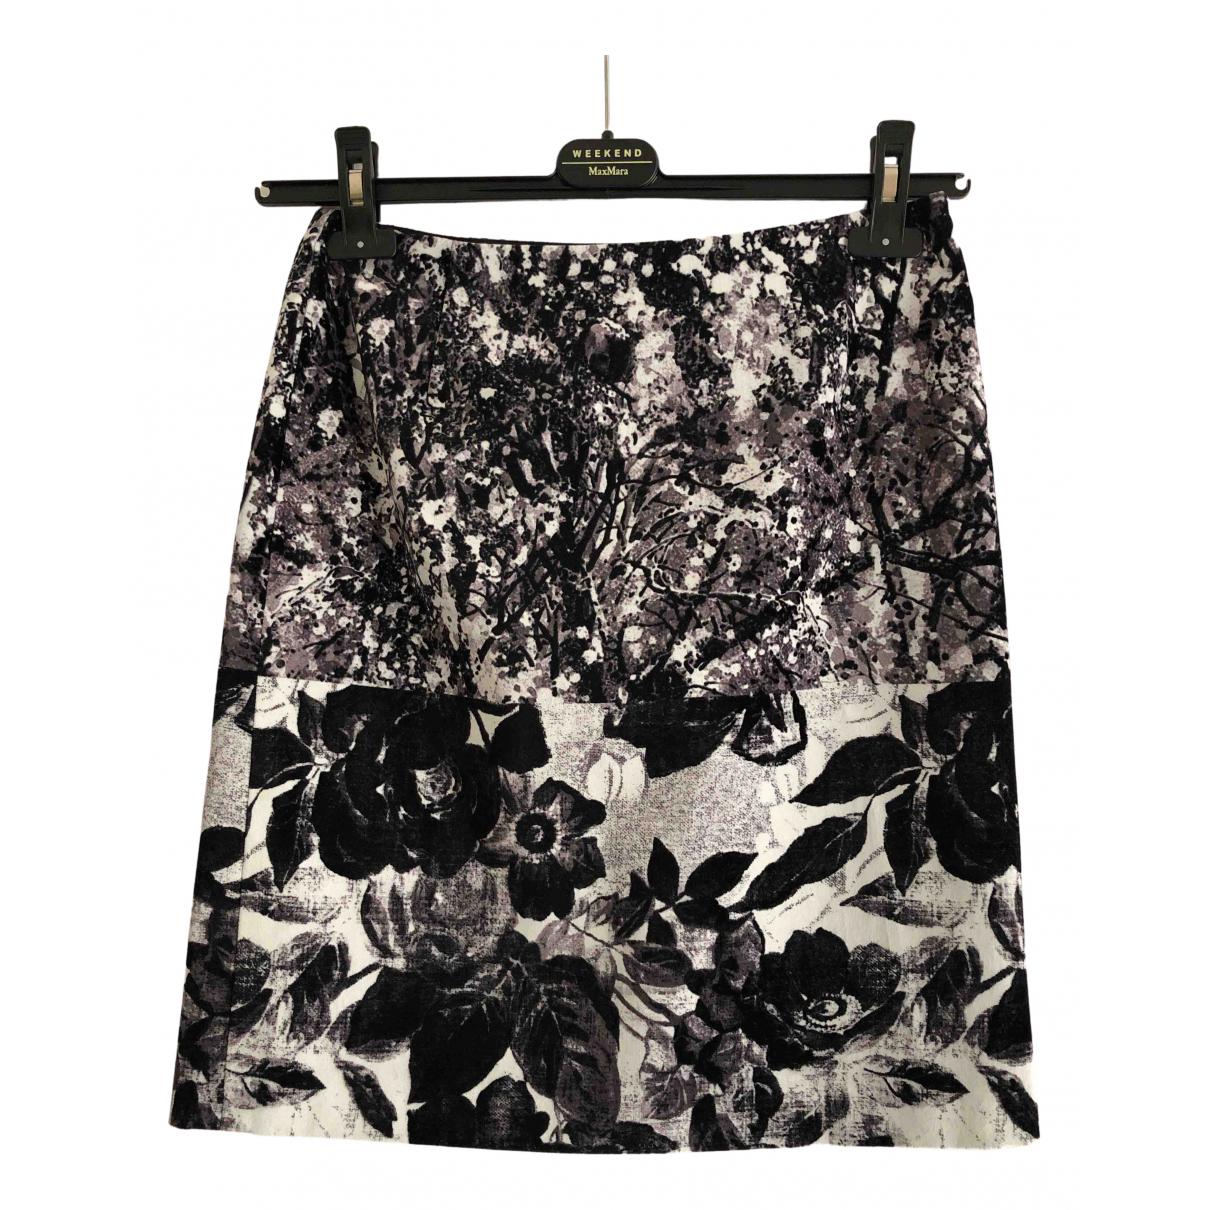 Max Mara Weekend N Black Cotton skirt for Women 6 UK